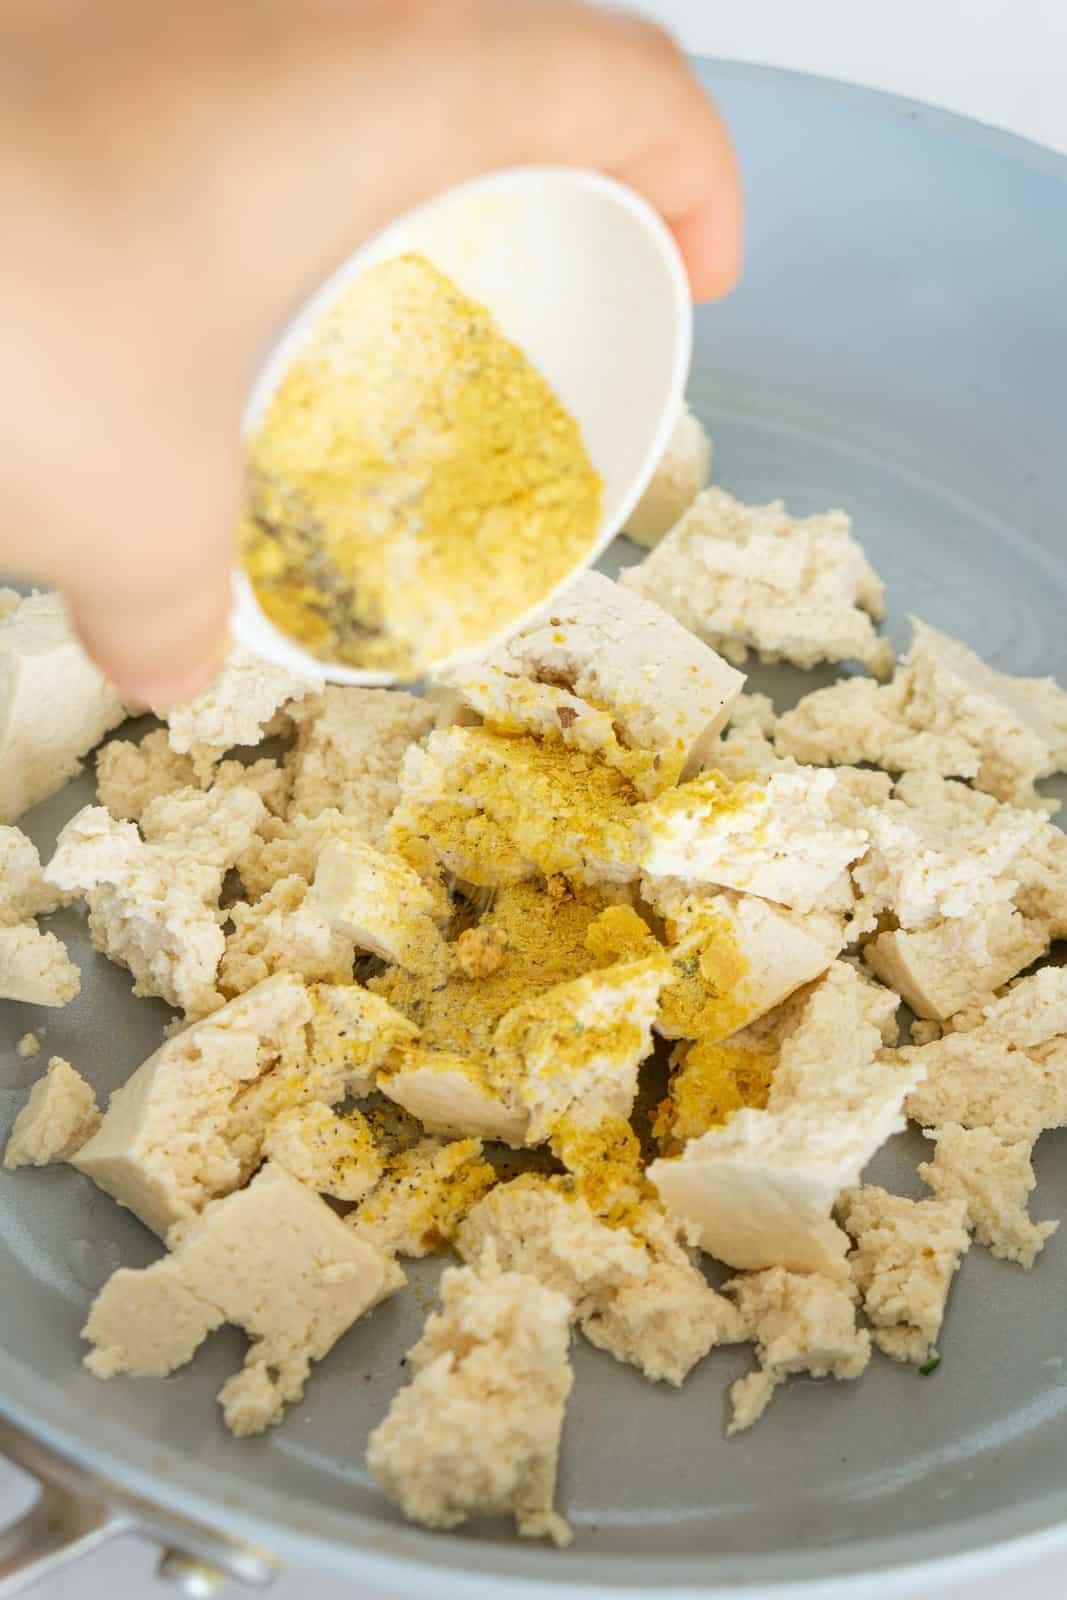 Adding seasonings to tofu to make tofu scramble.